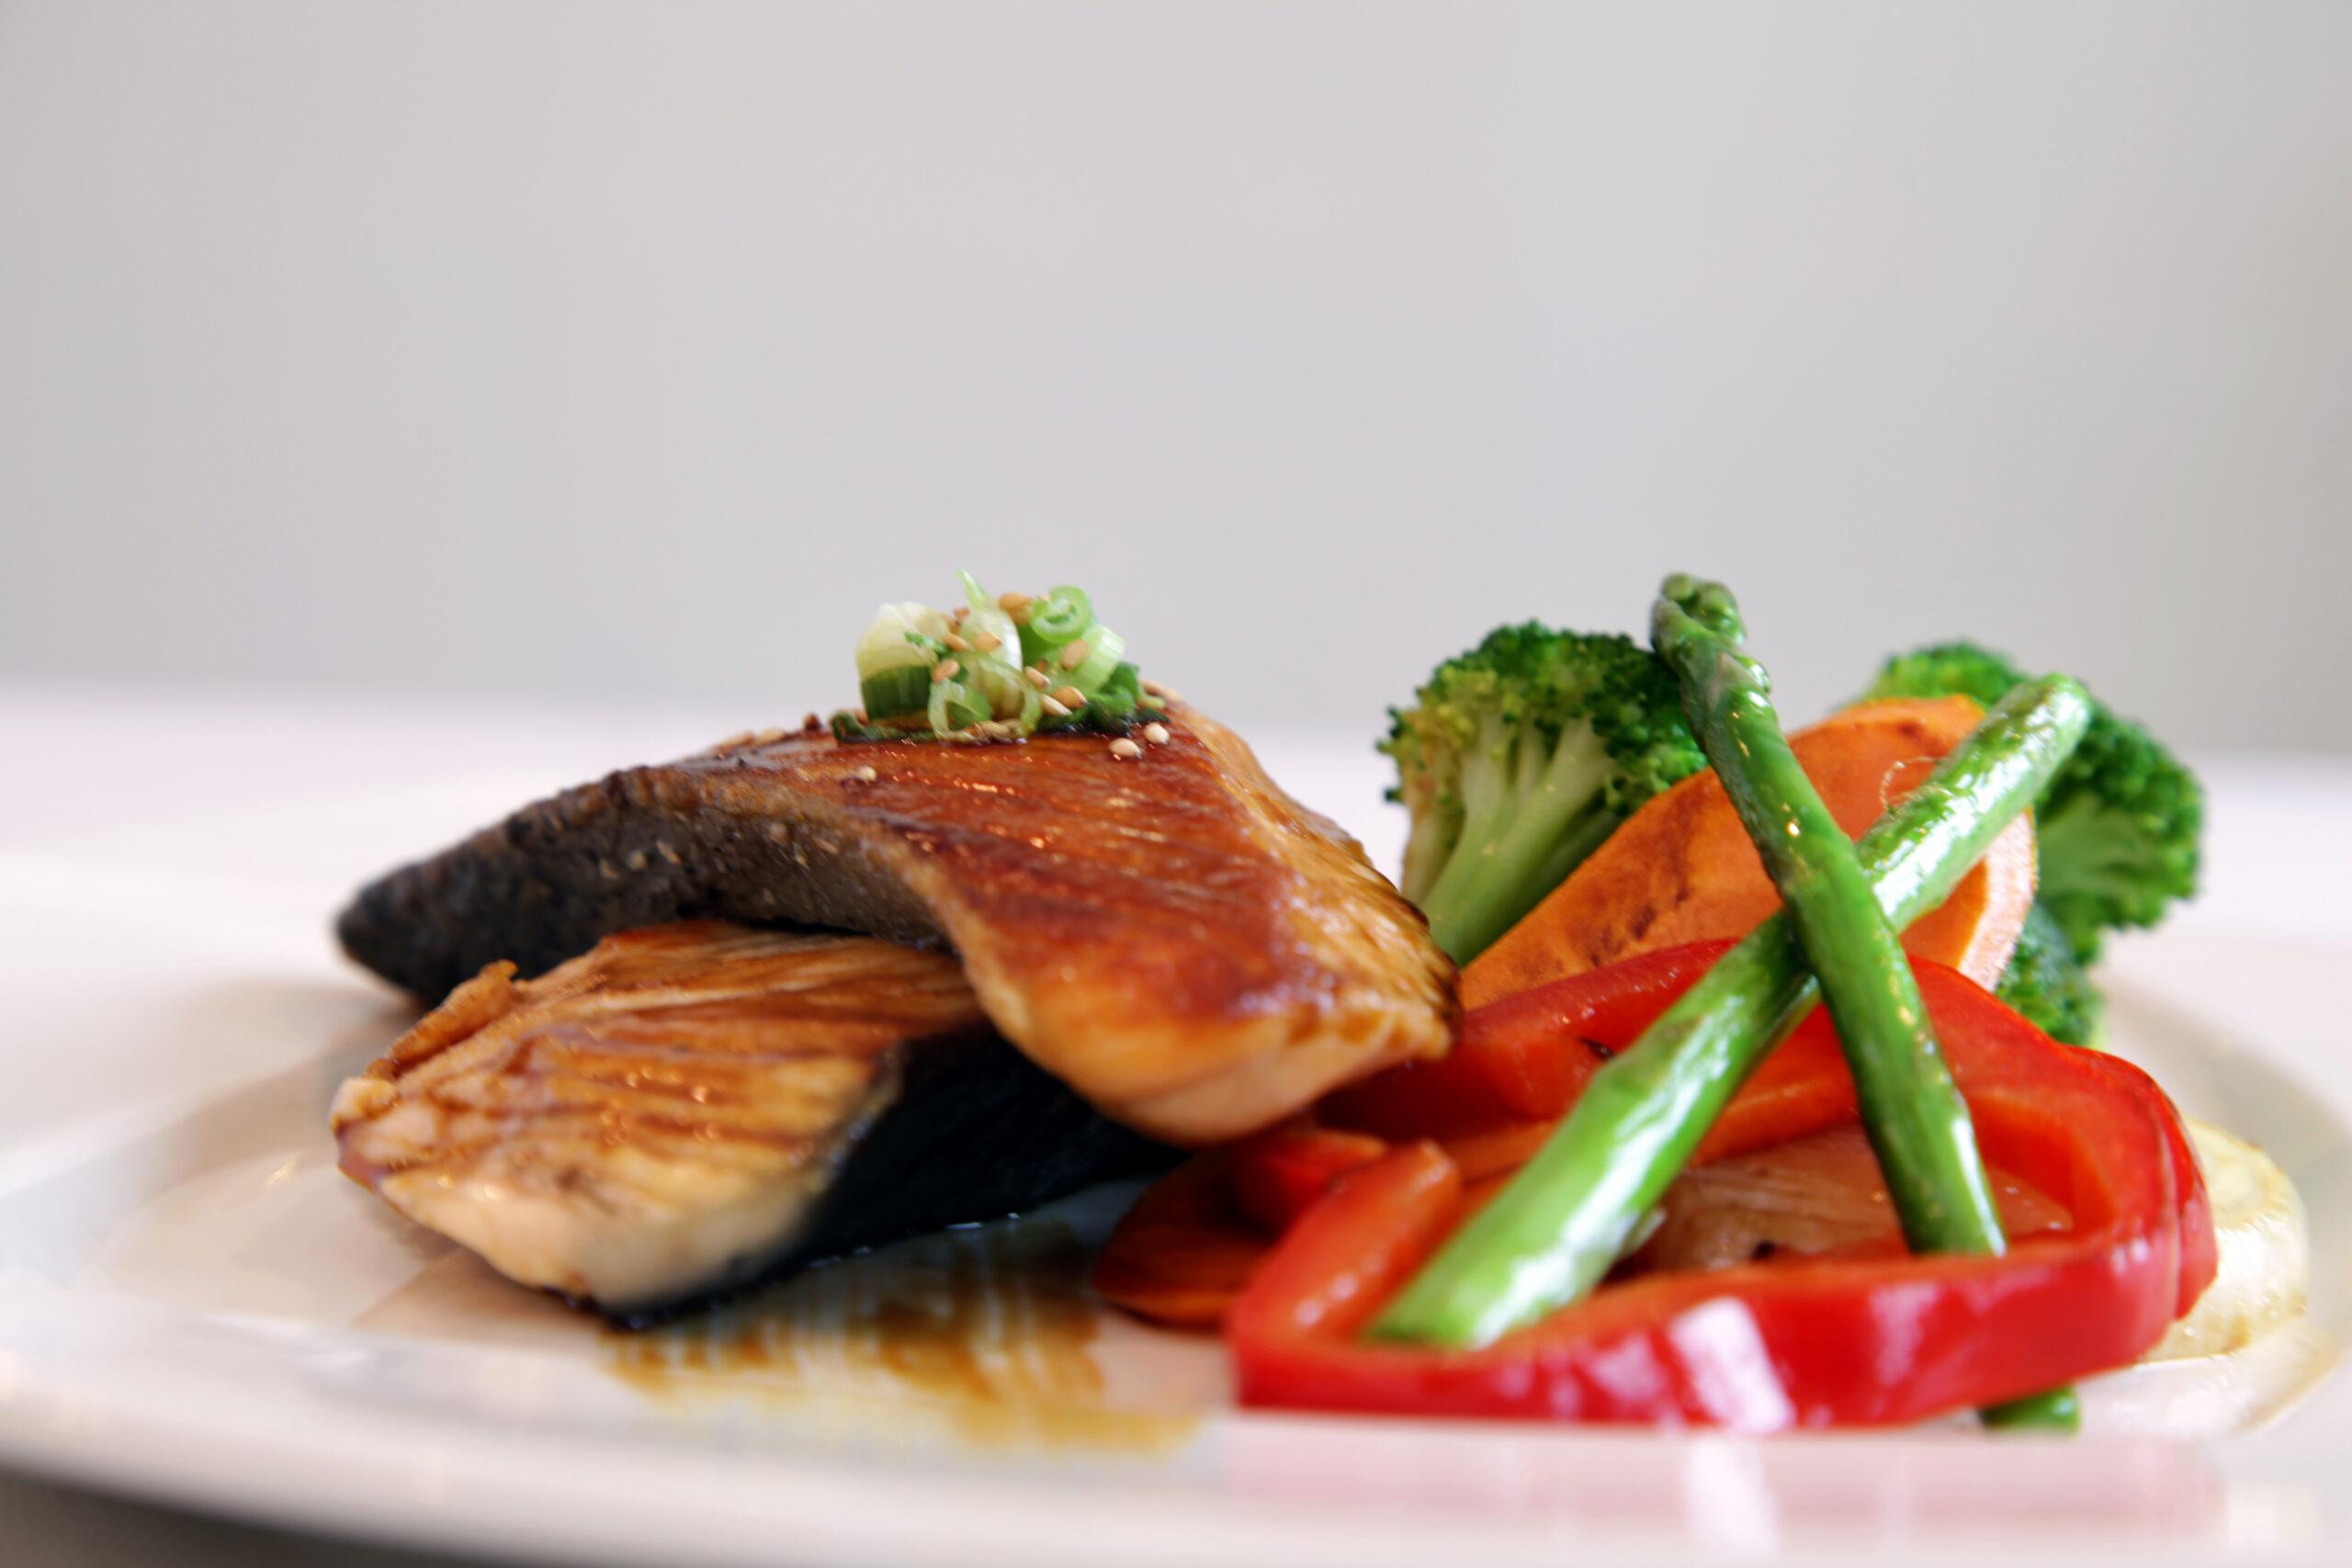 Salmon teriyaki  <br>Grilled salmon and vegetables in a teriyaki sauce